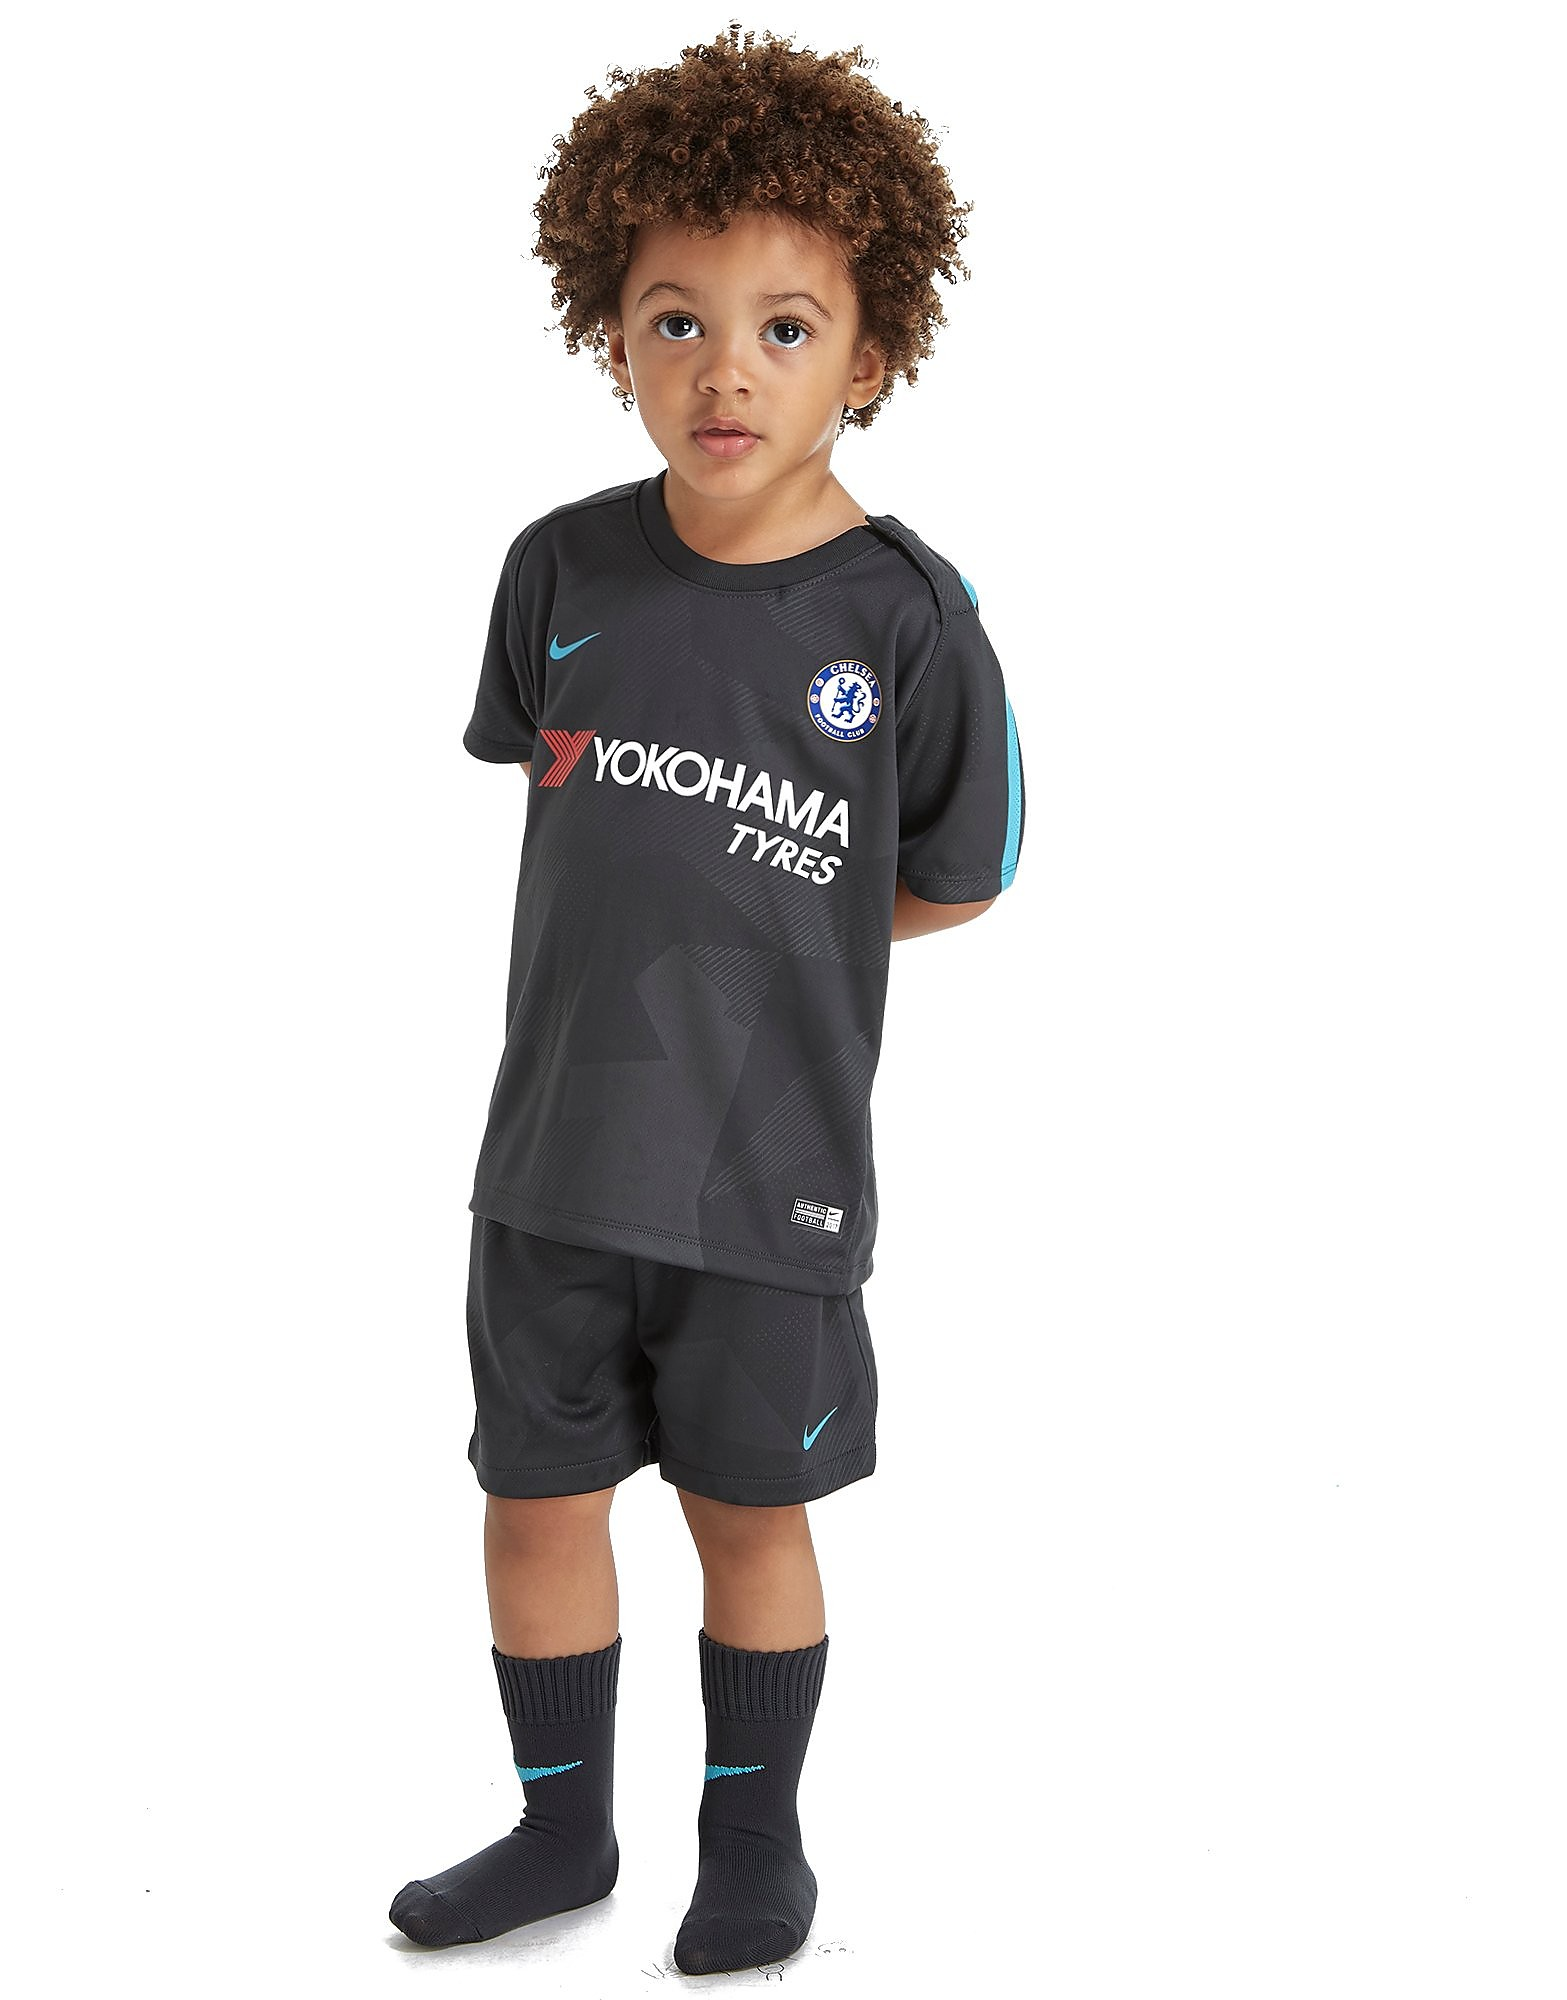 Nike Ensemble Chelsea FC 2017/18 Third Bébé